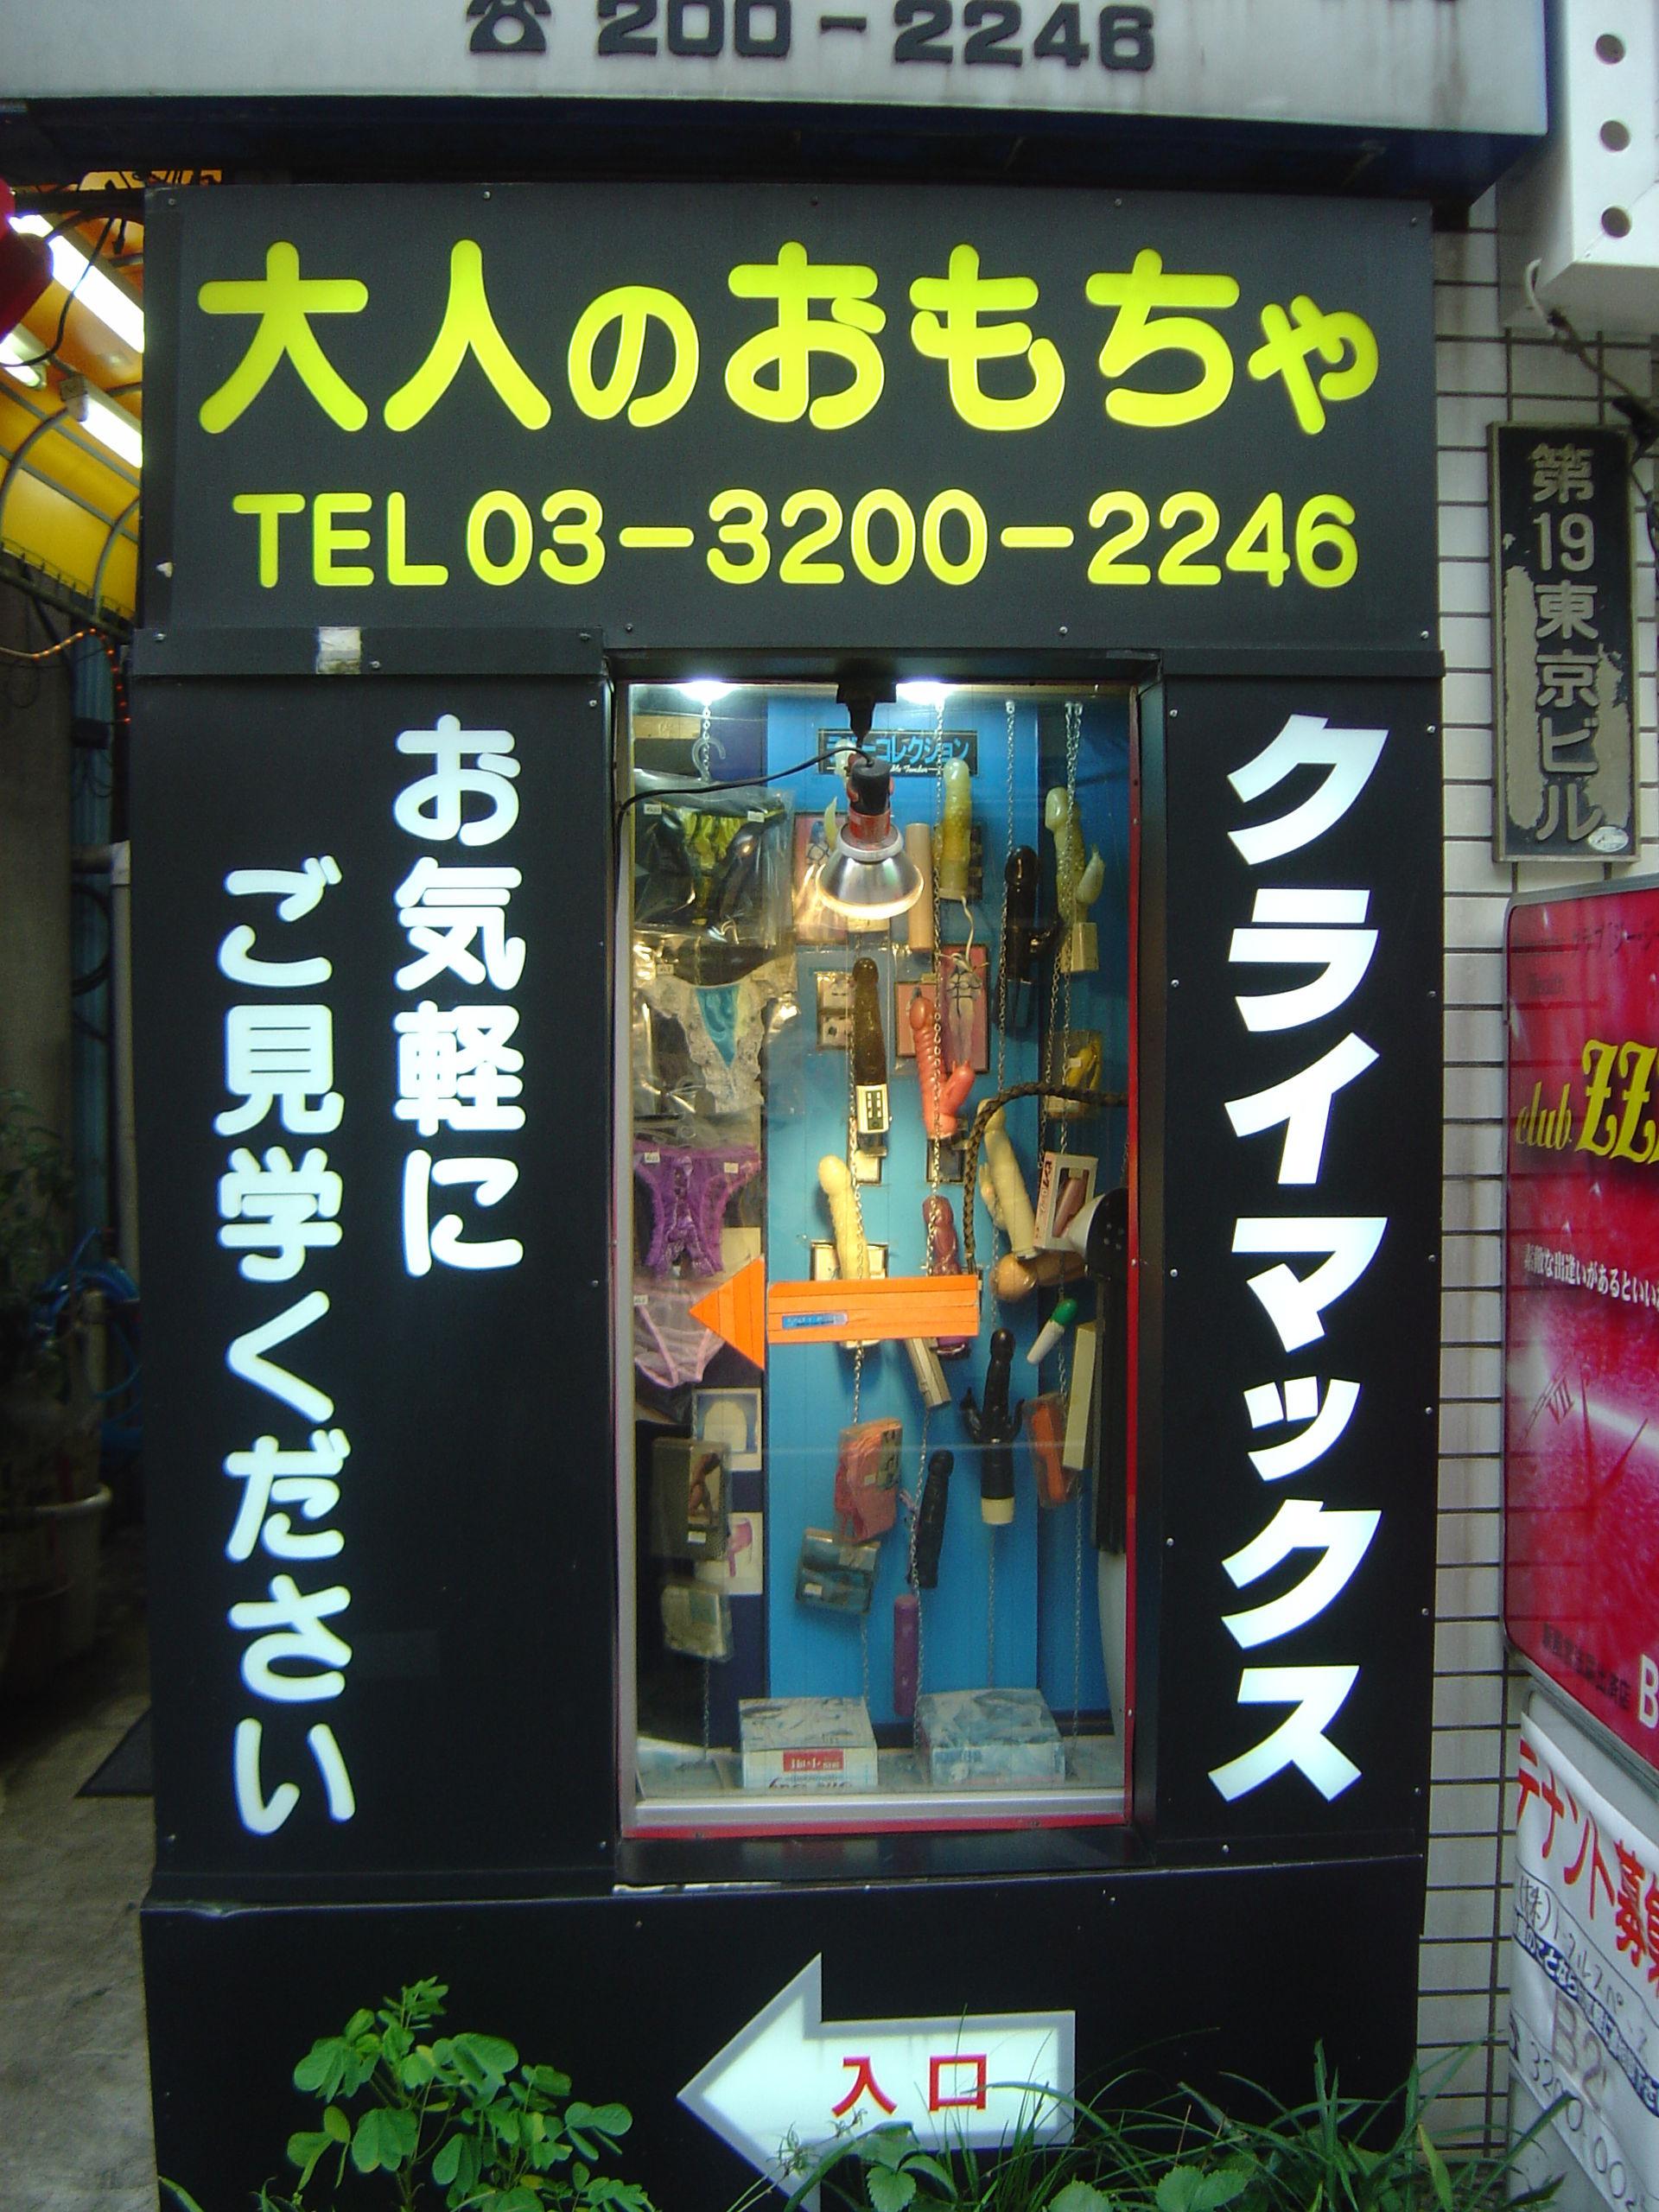 helsinki sex shop seksiseura tampere